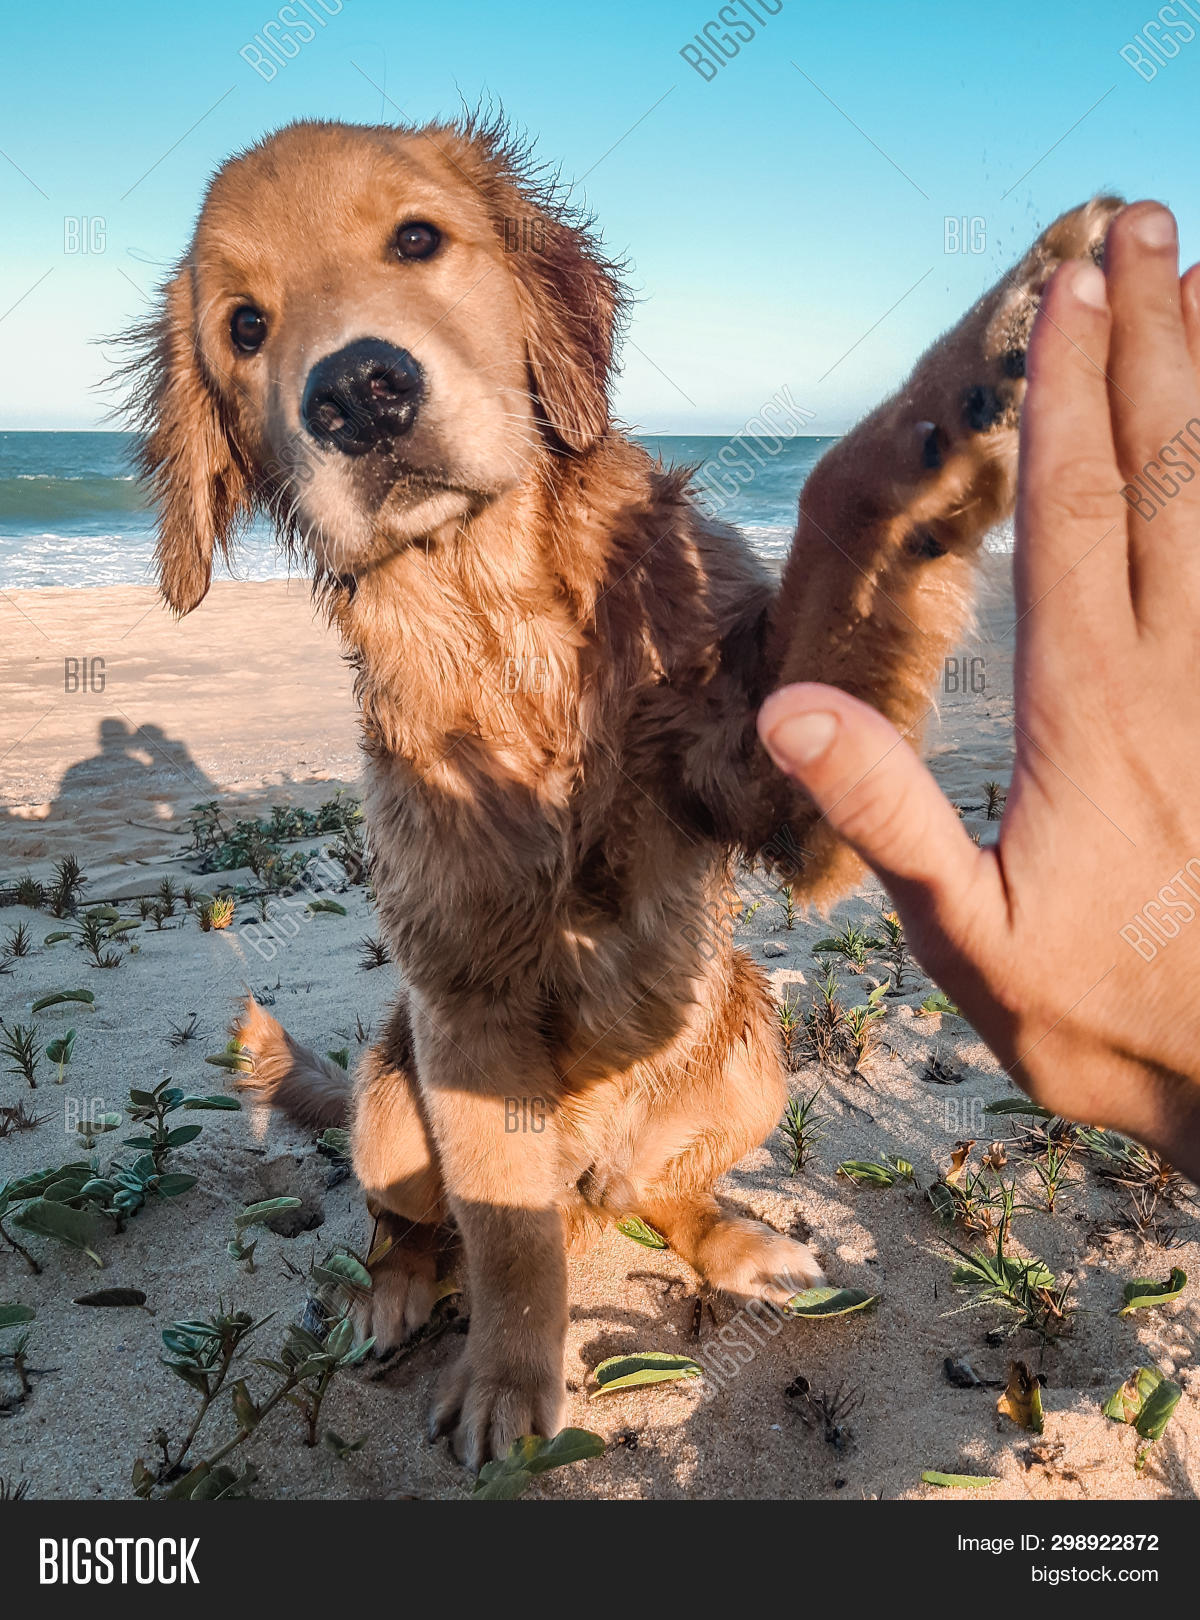 Golden Retriever Puppy Image Photo Free Trial Bigstock